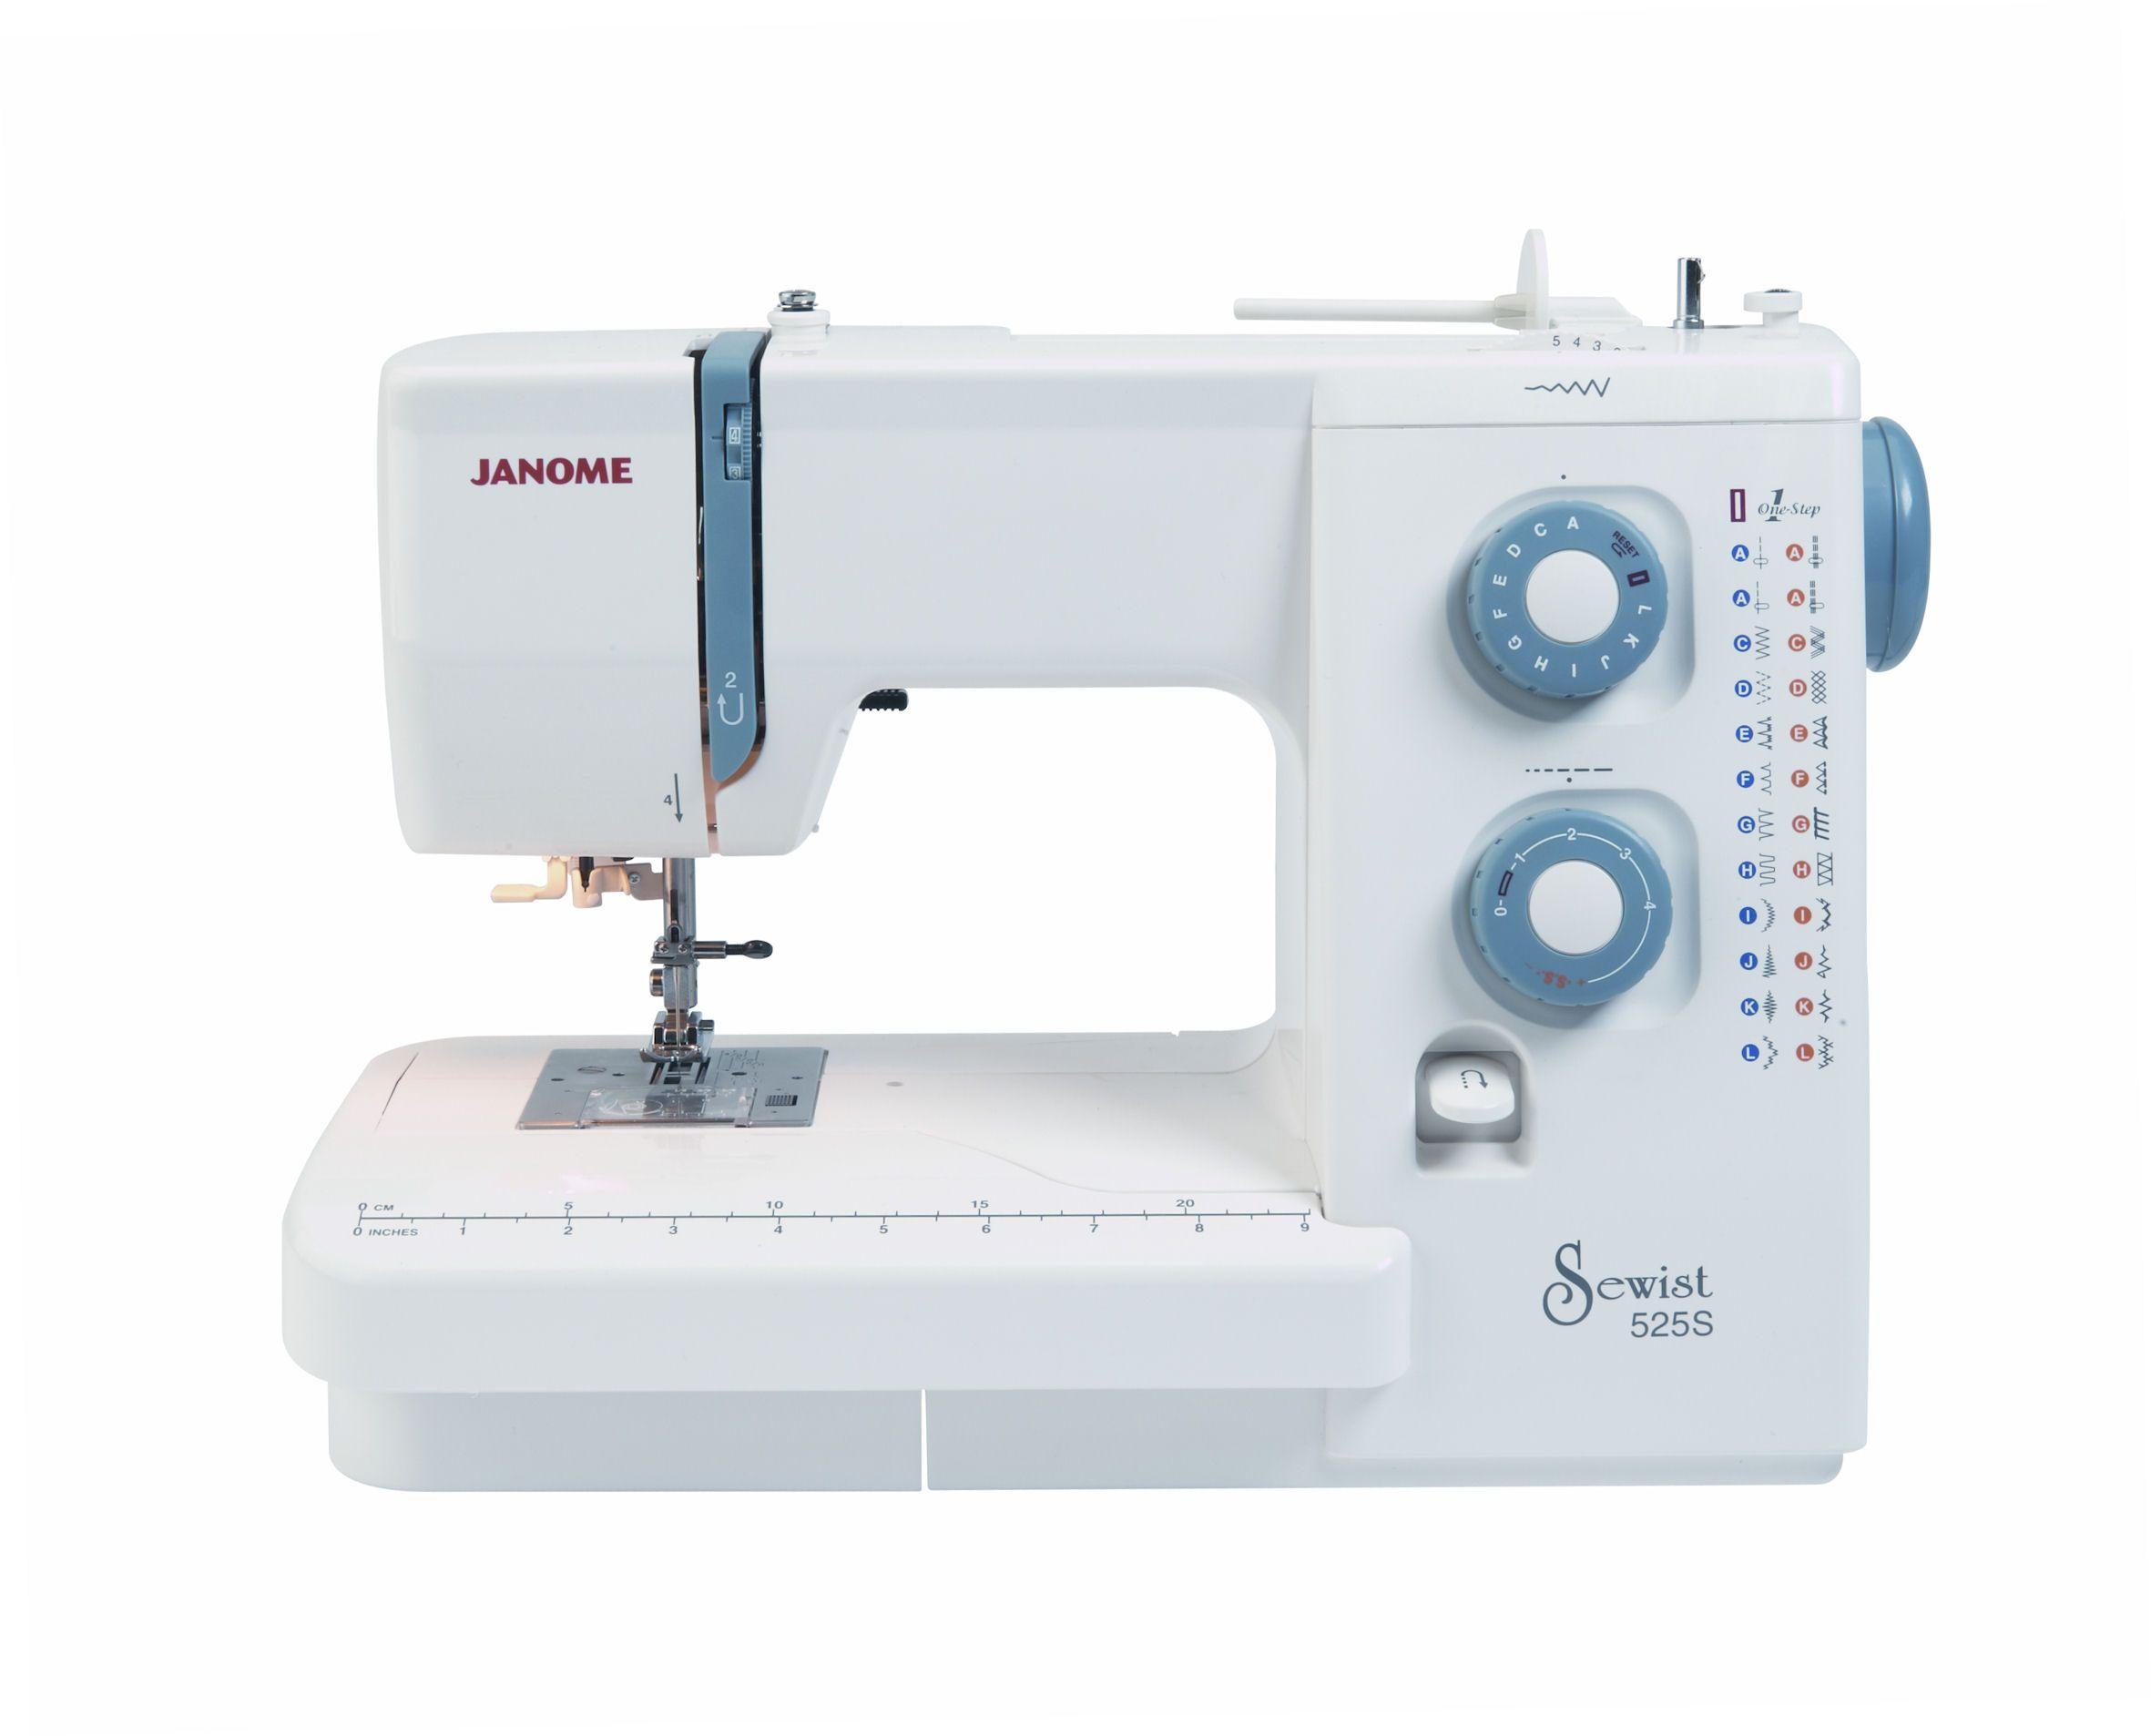 Win a Janome Sewing Machine - Crafts Giveaways – Crafts Beautiful ...